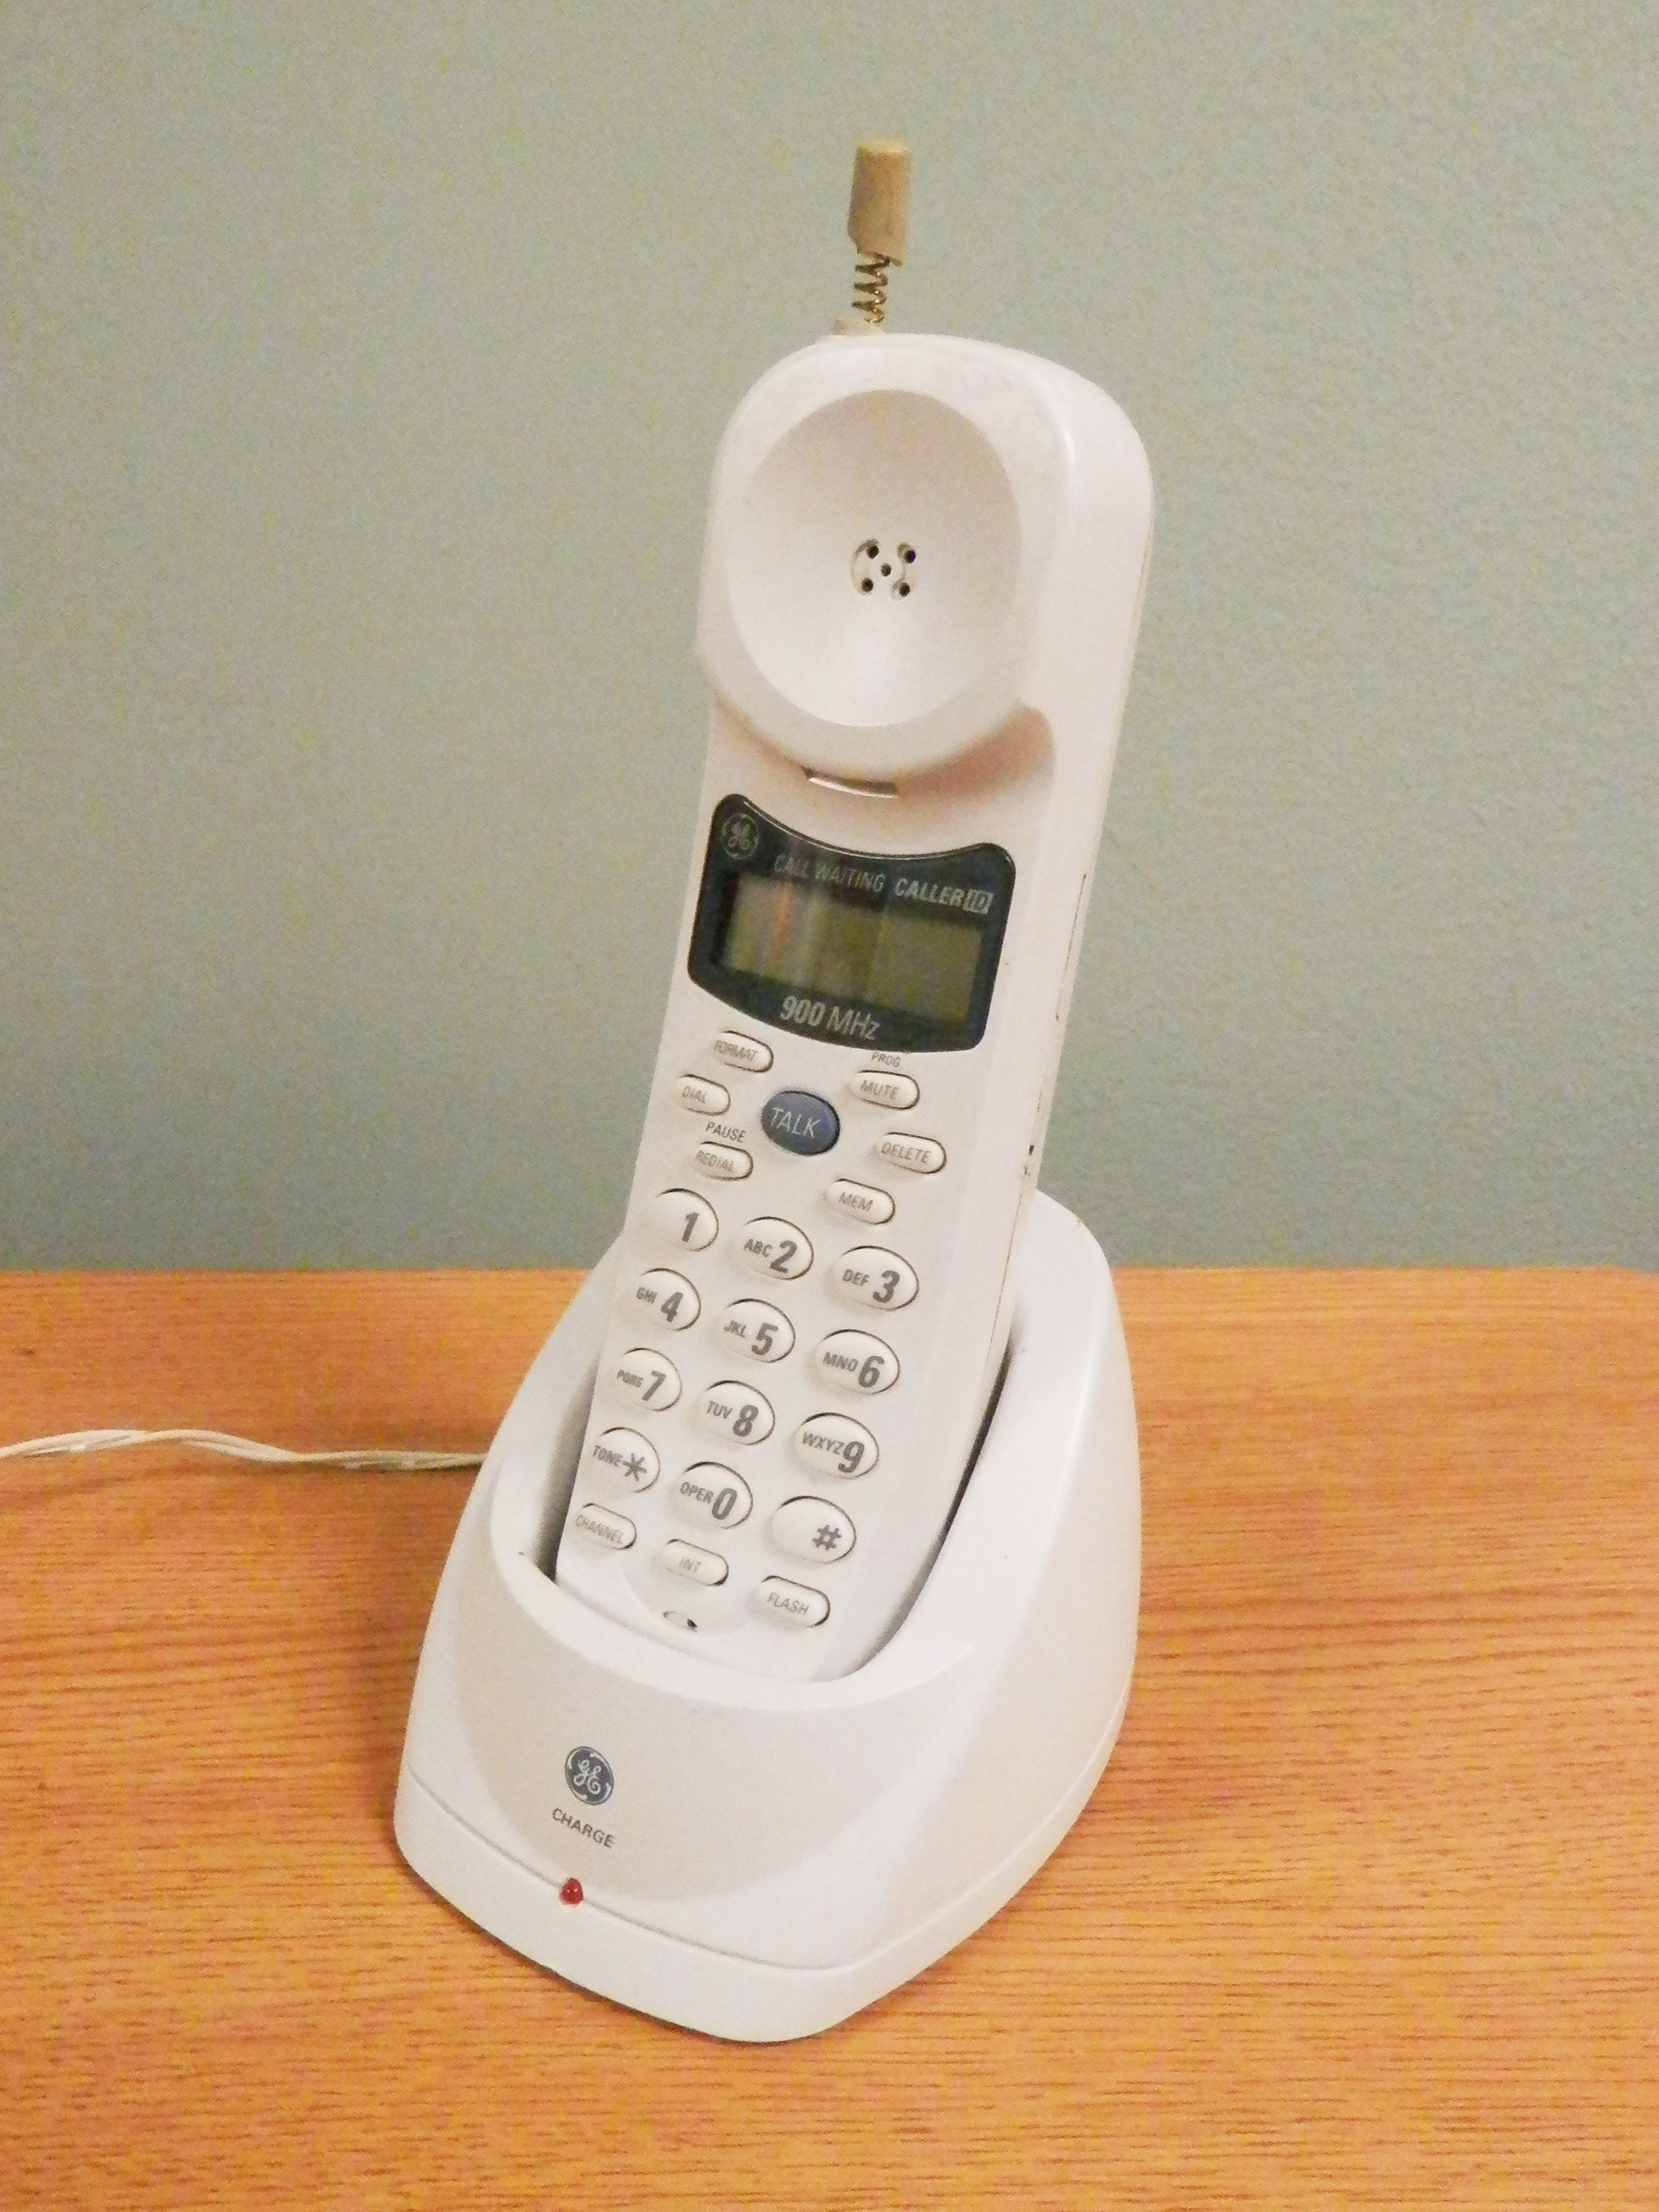 Cordless Phone 900mhz GE